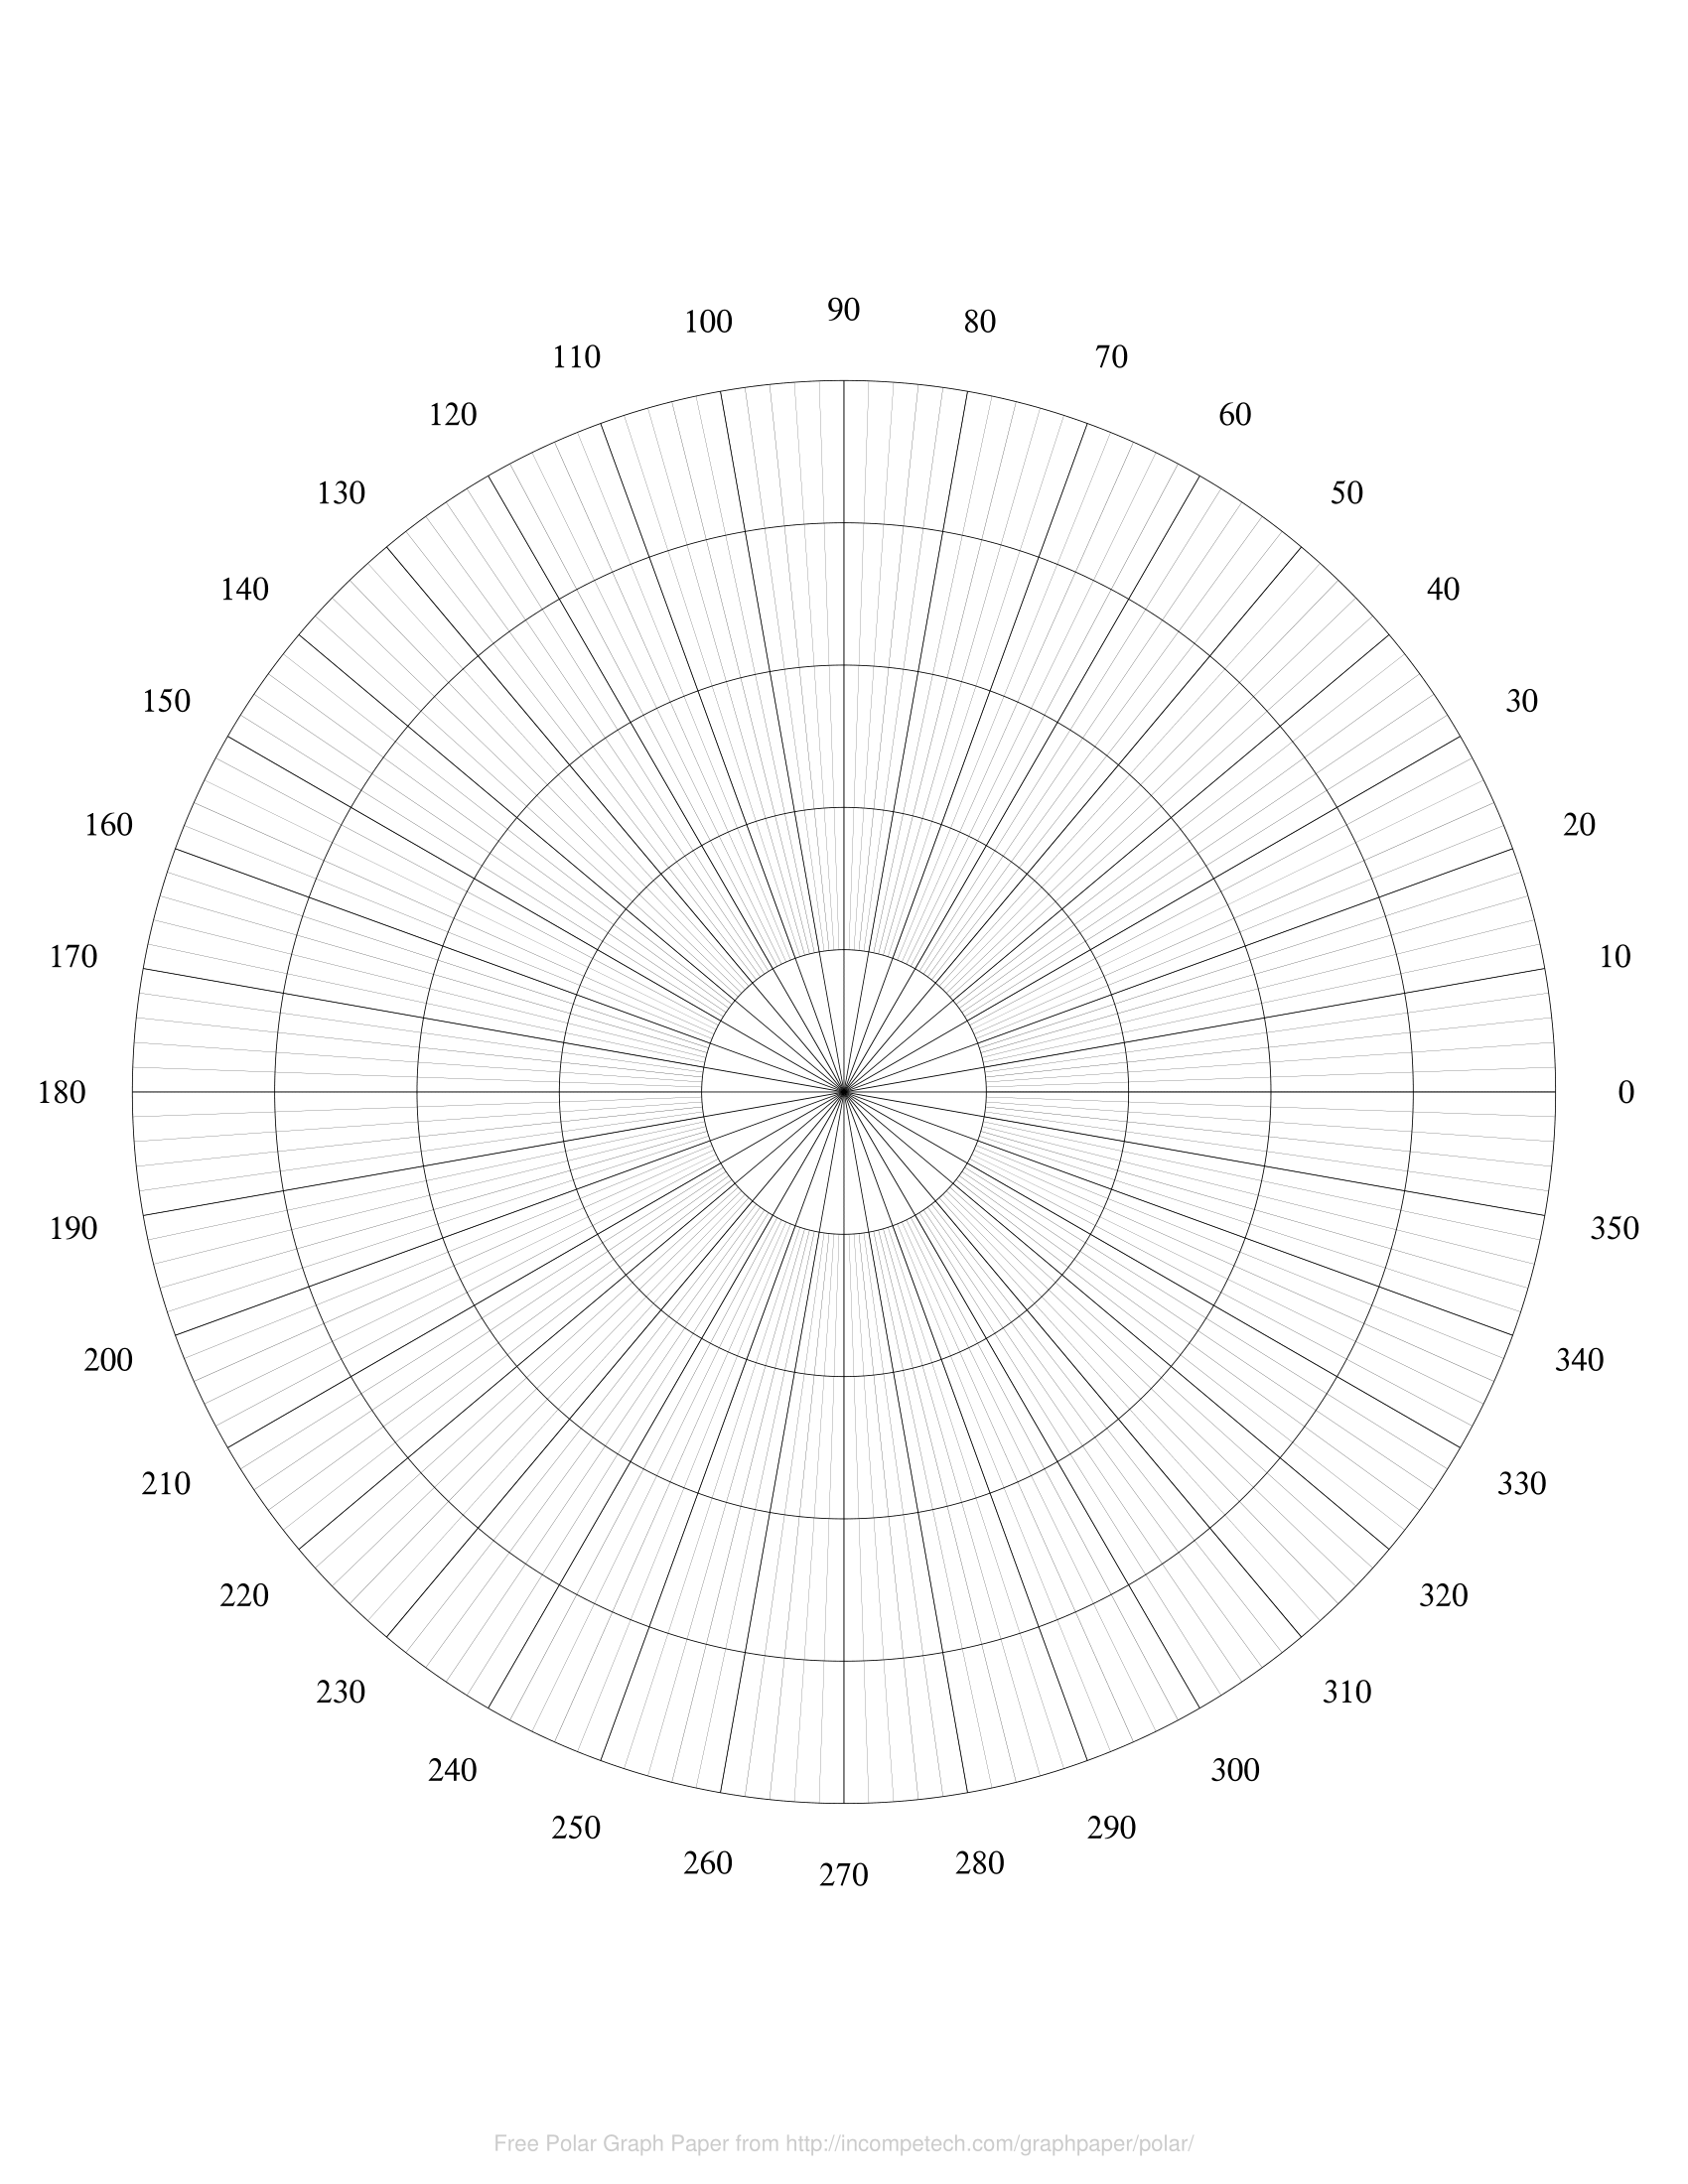 Sample of Polar Graph Paper